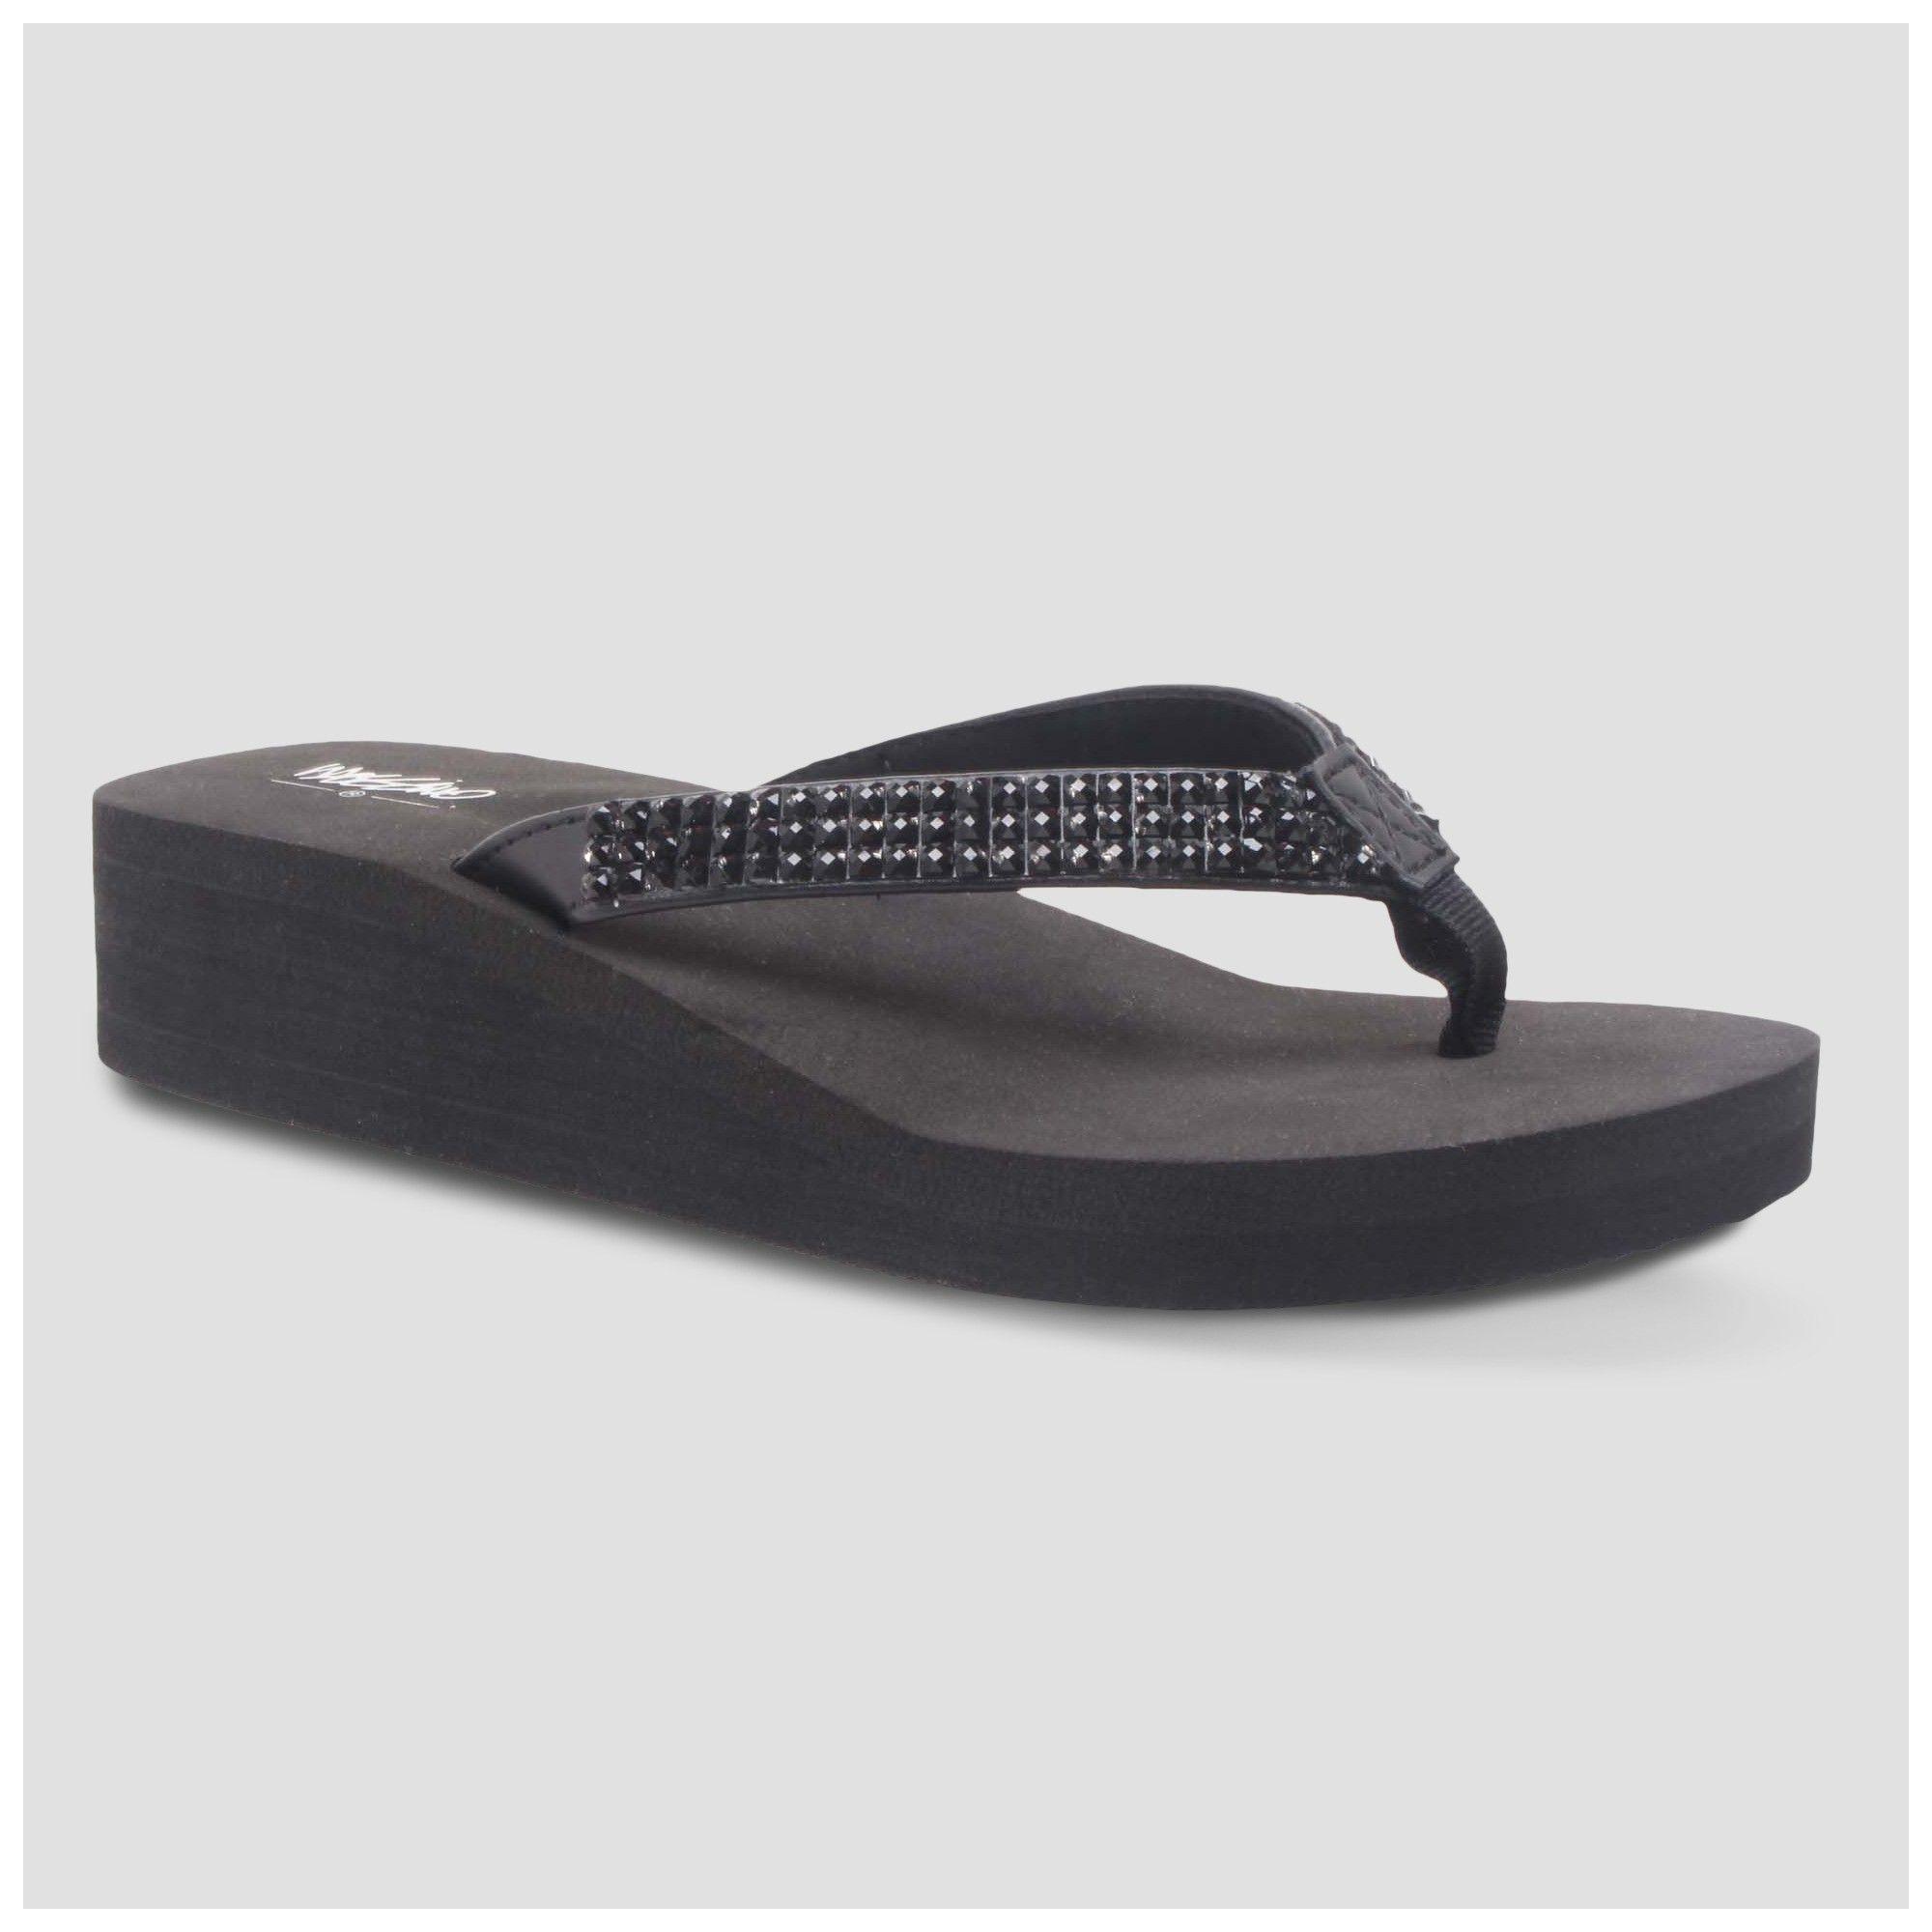 2a2bf6cd3995 Women s Lannette Flip Flop Sandals - Mossimo Black 12